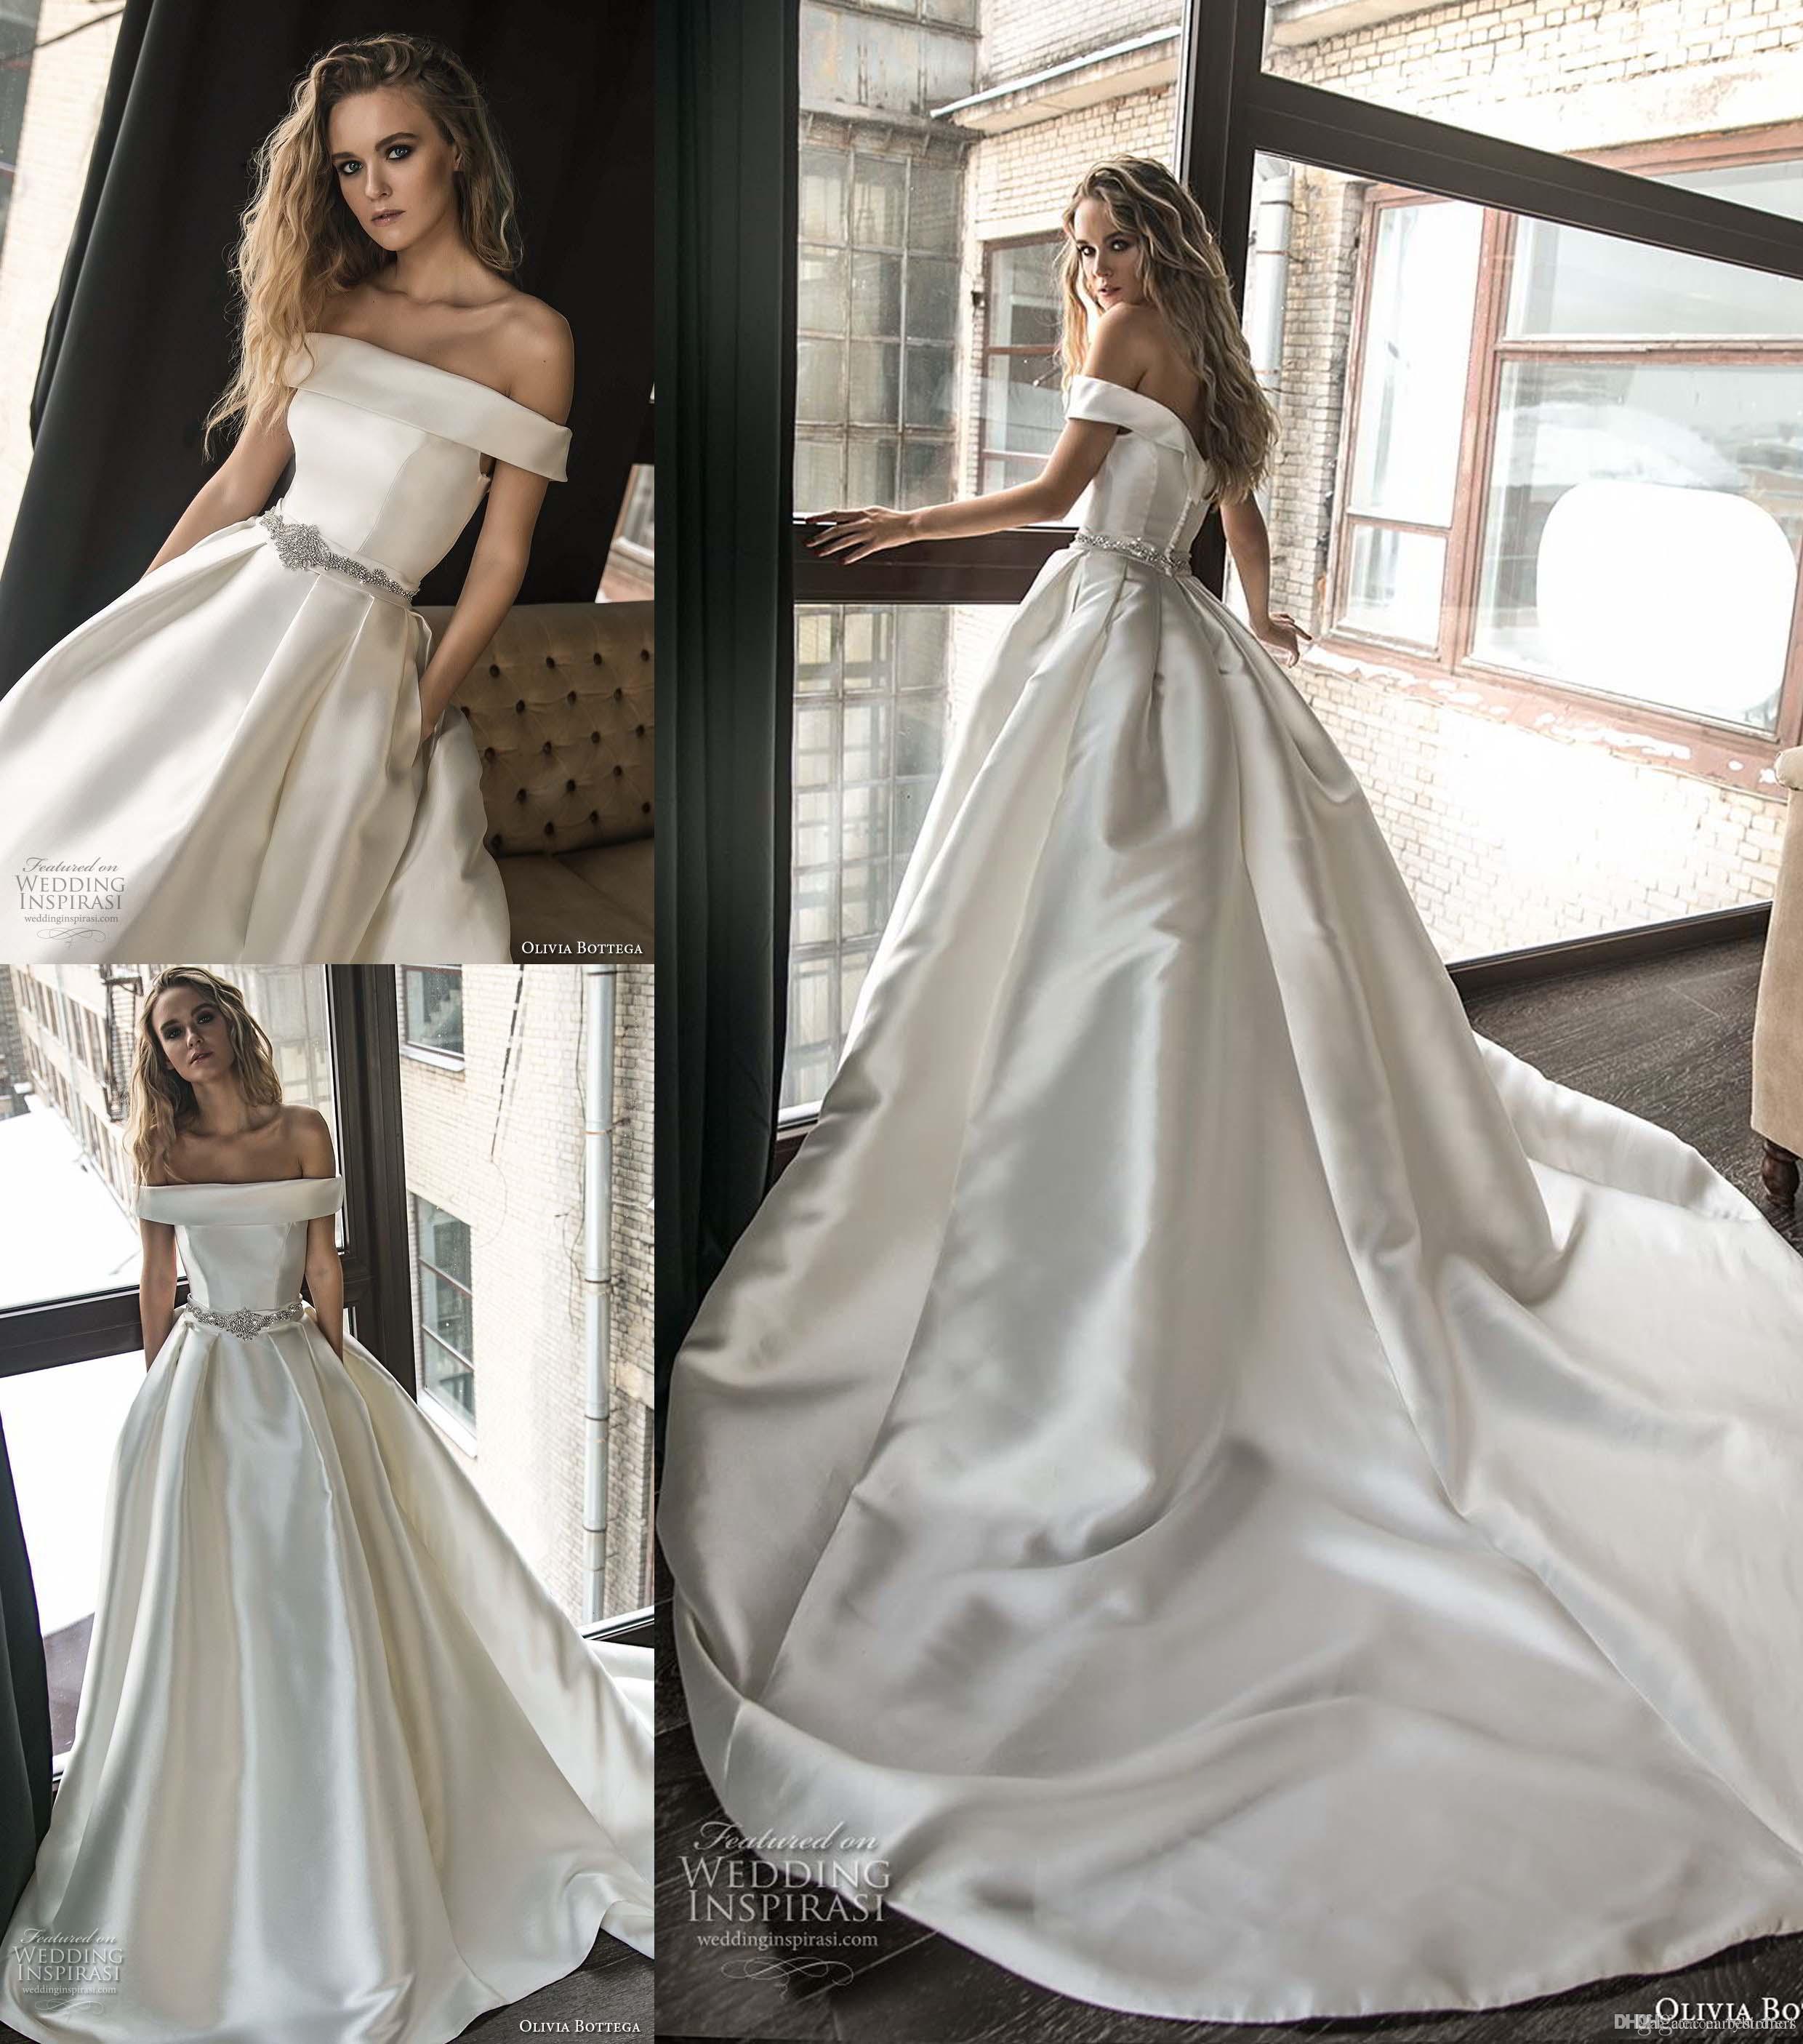 acd808572b1d Discount Princess Off Shoulder Satin A Line Wedding Dresses 2019 With  Beaded Crystal Sash Custom Made Bridal Wedding Gowns Vestido De Novia Gold  Wedding ...